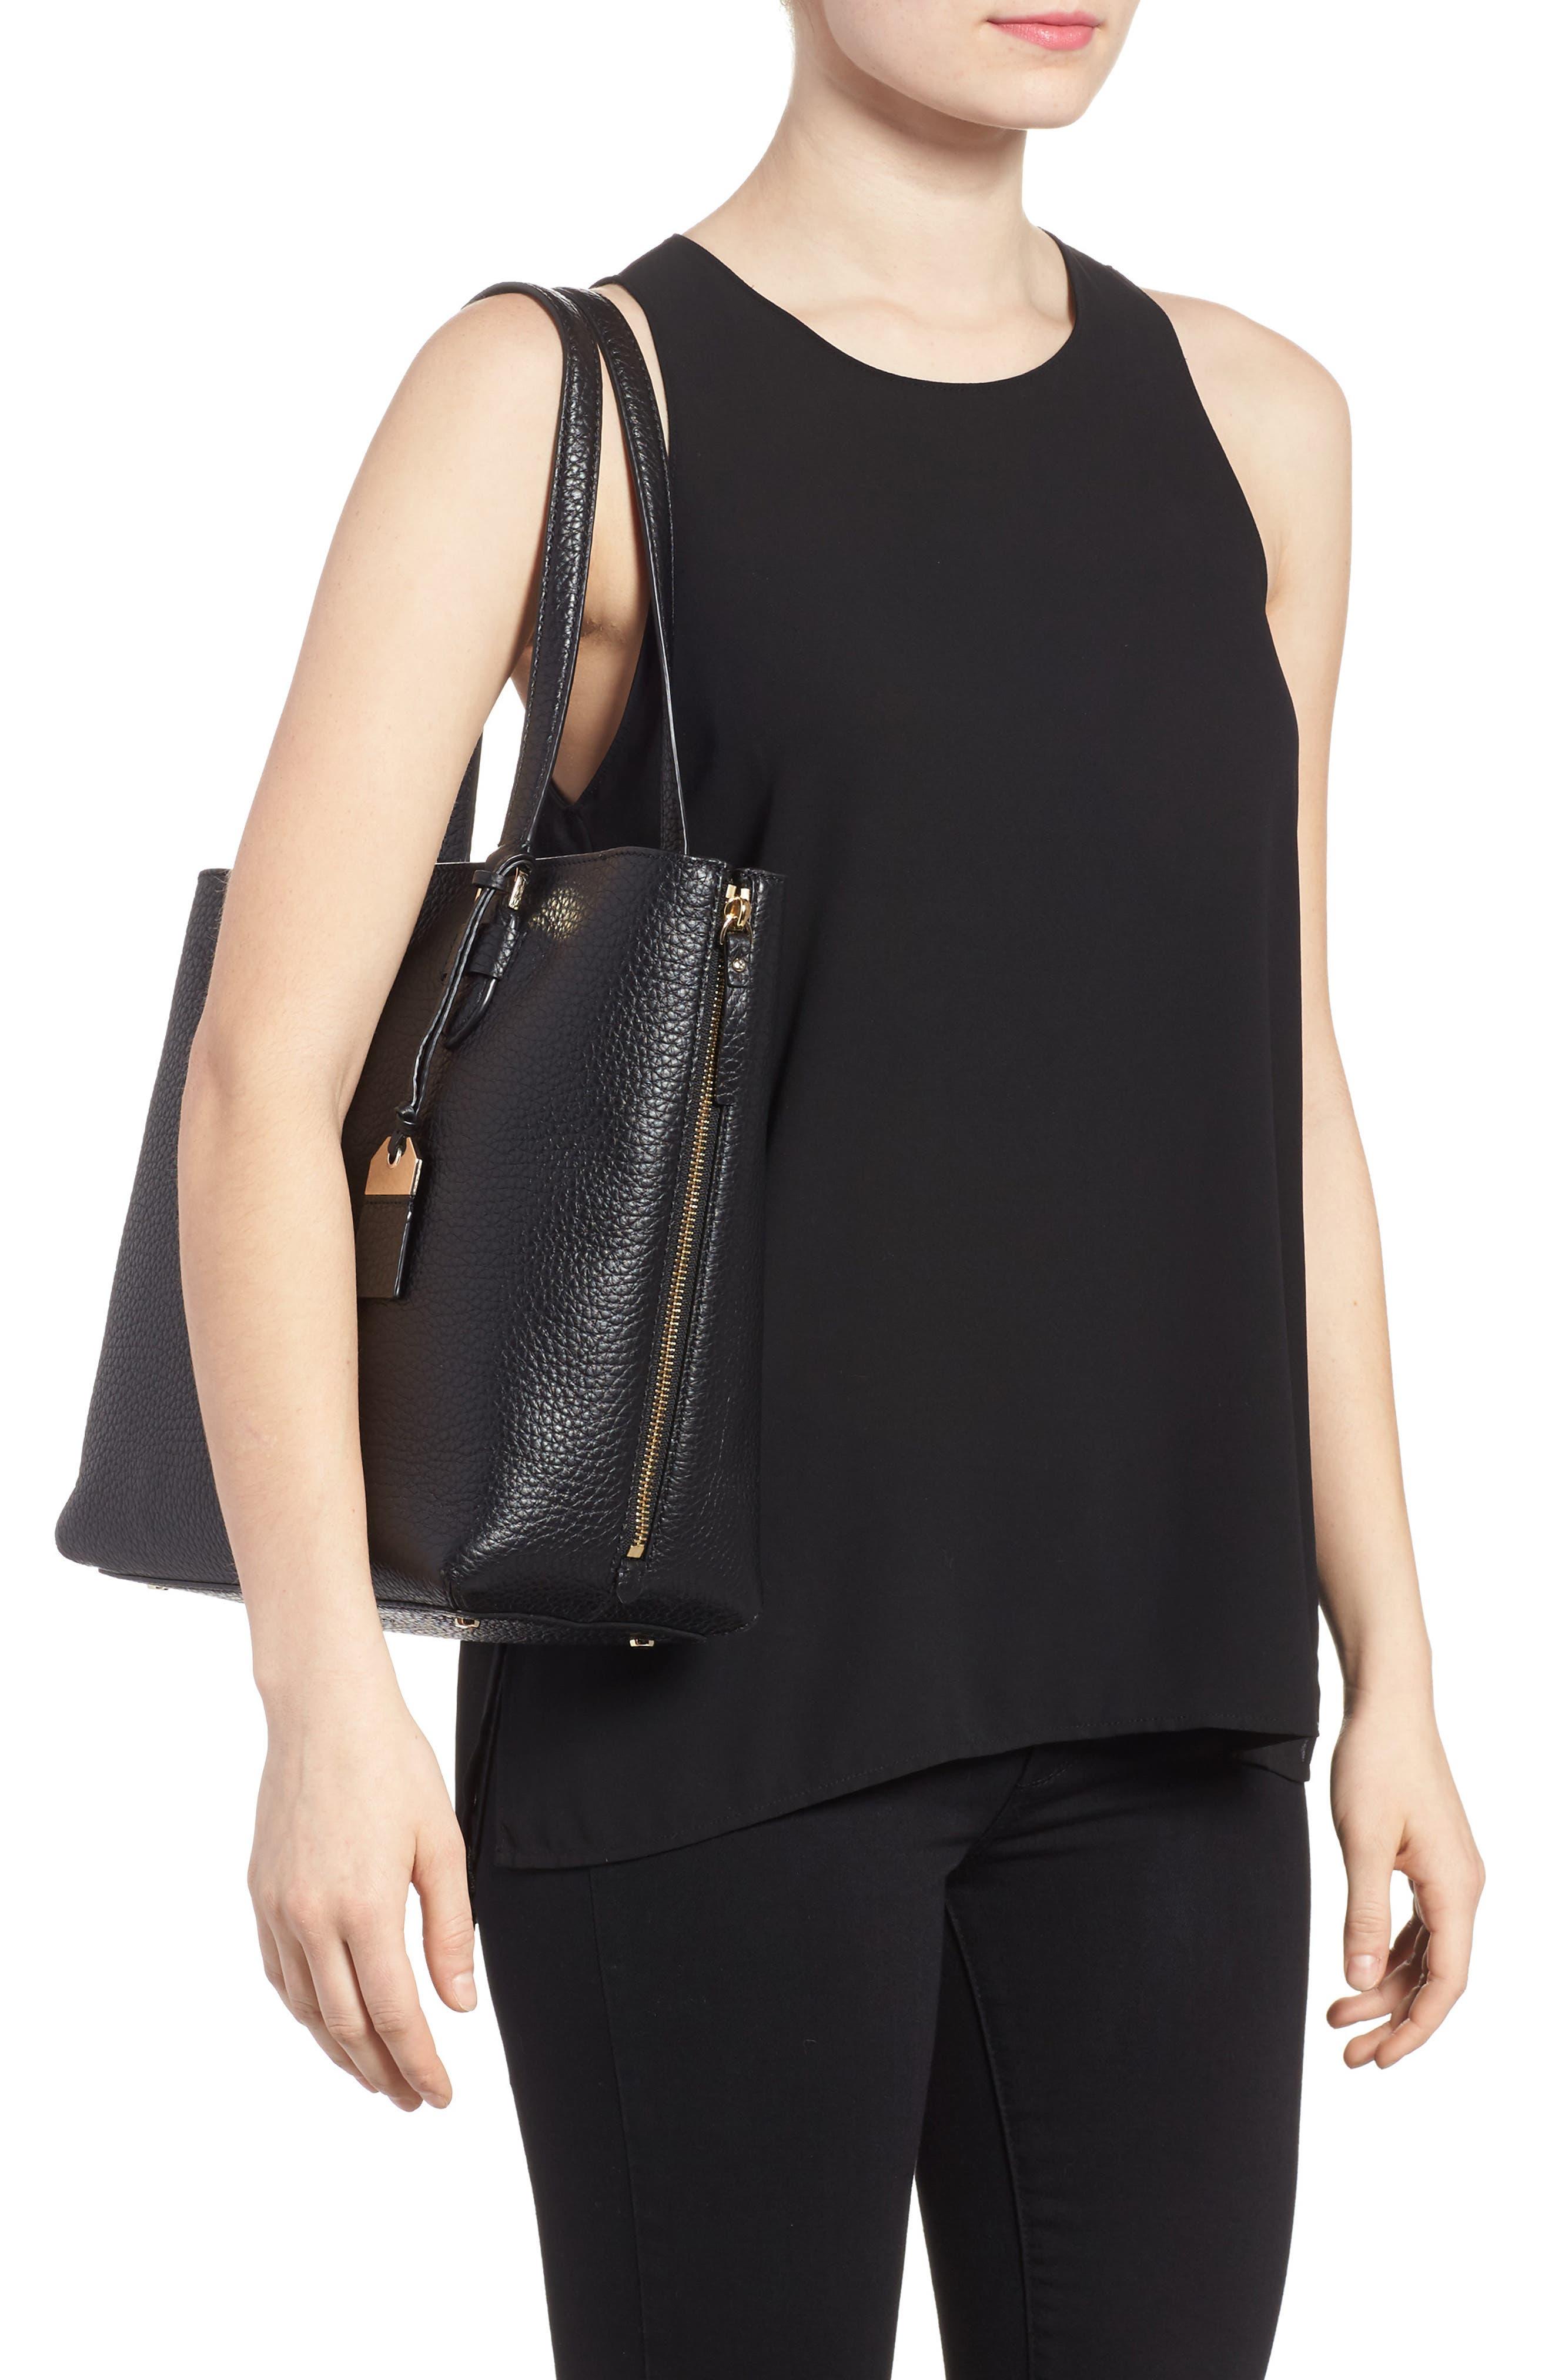 carter street - selena leather tote,                             Alternate thumbnail 2, color,                             Black